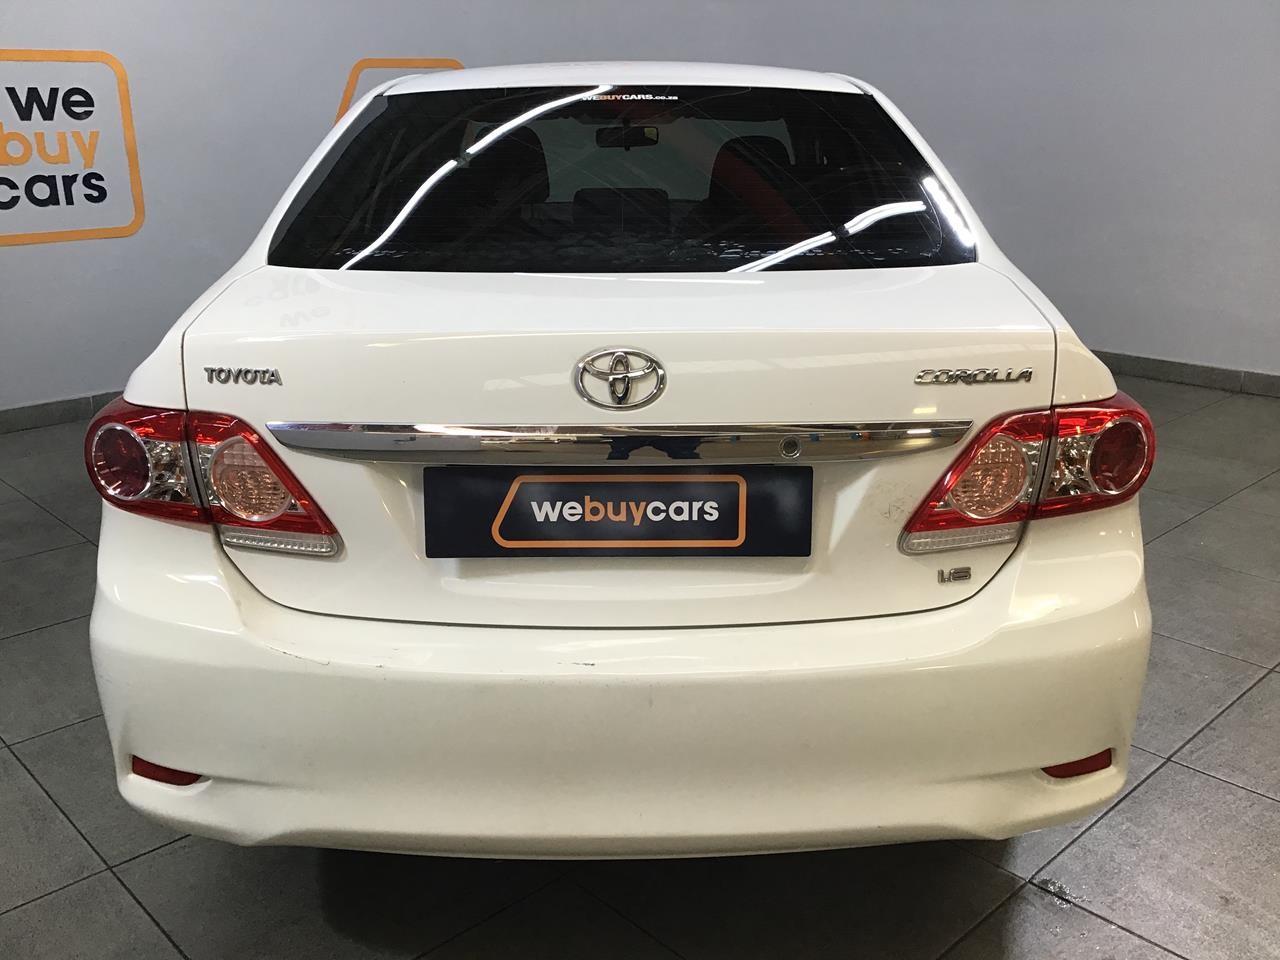 Used 2010 Toyota Corolla 1 6 Advanced Auto For Sale Webuycars